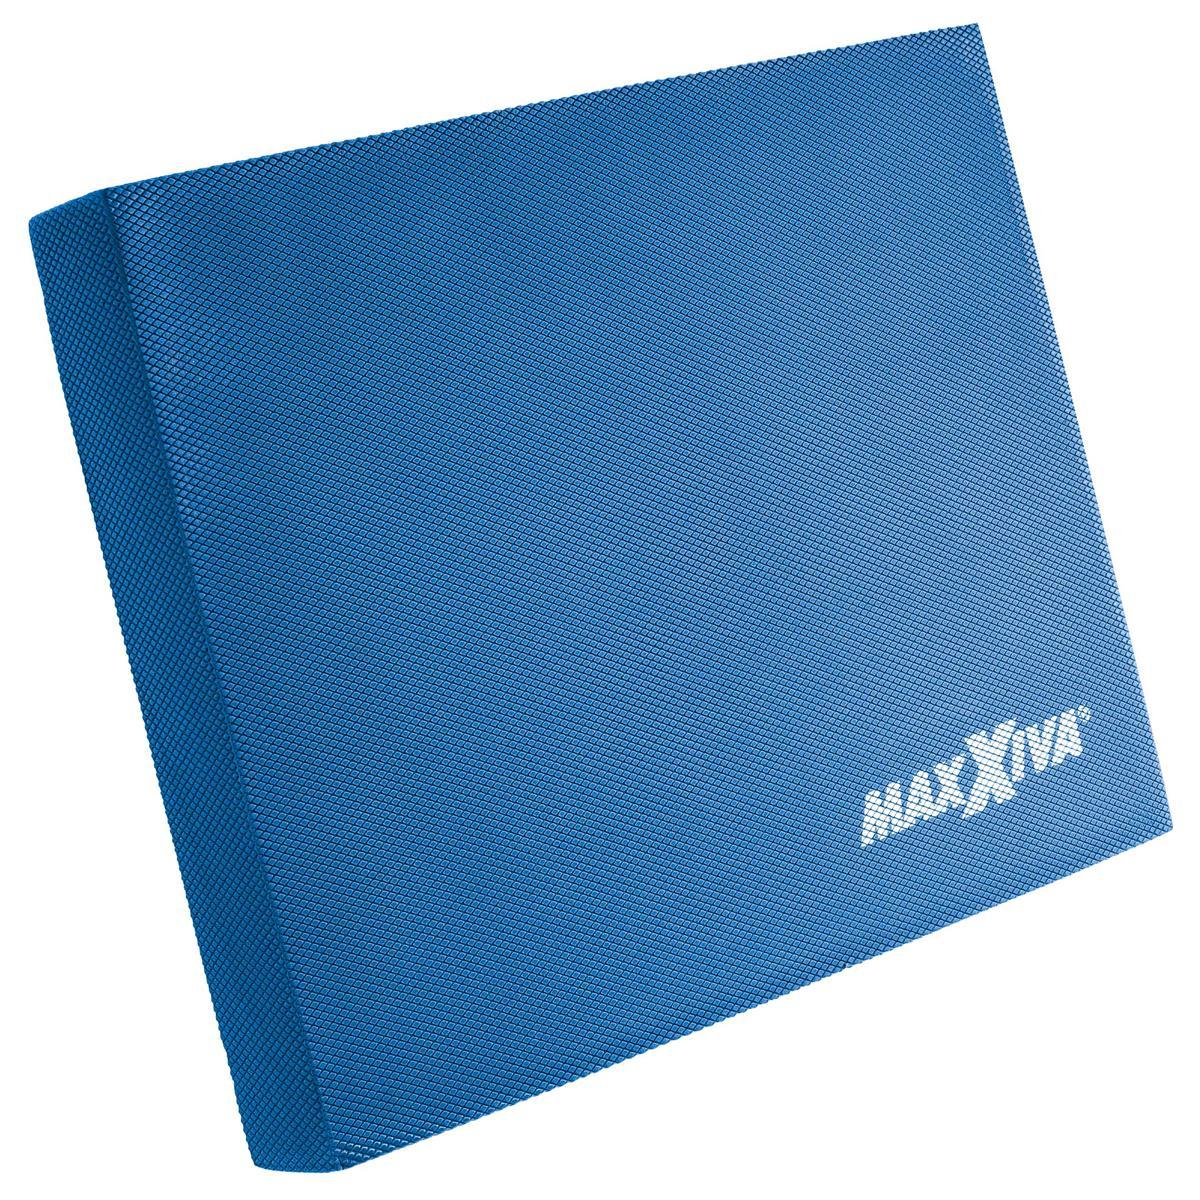 MAXXIVA Balancepad dunkelblau Sport Fitness 50x40x6 cm Balancekissen